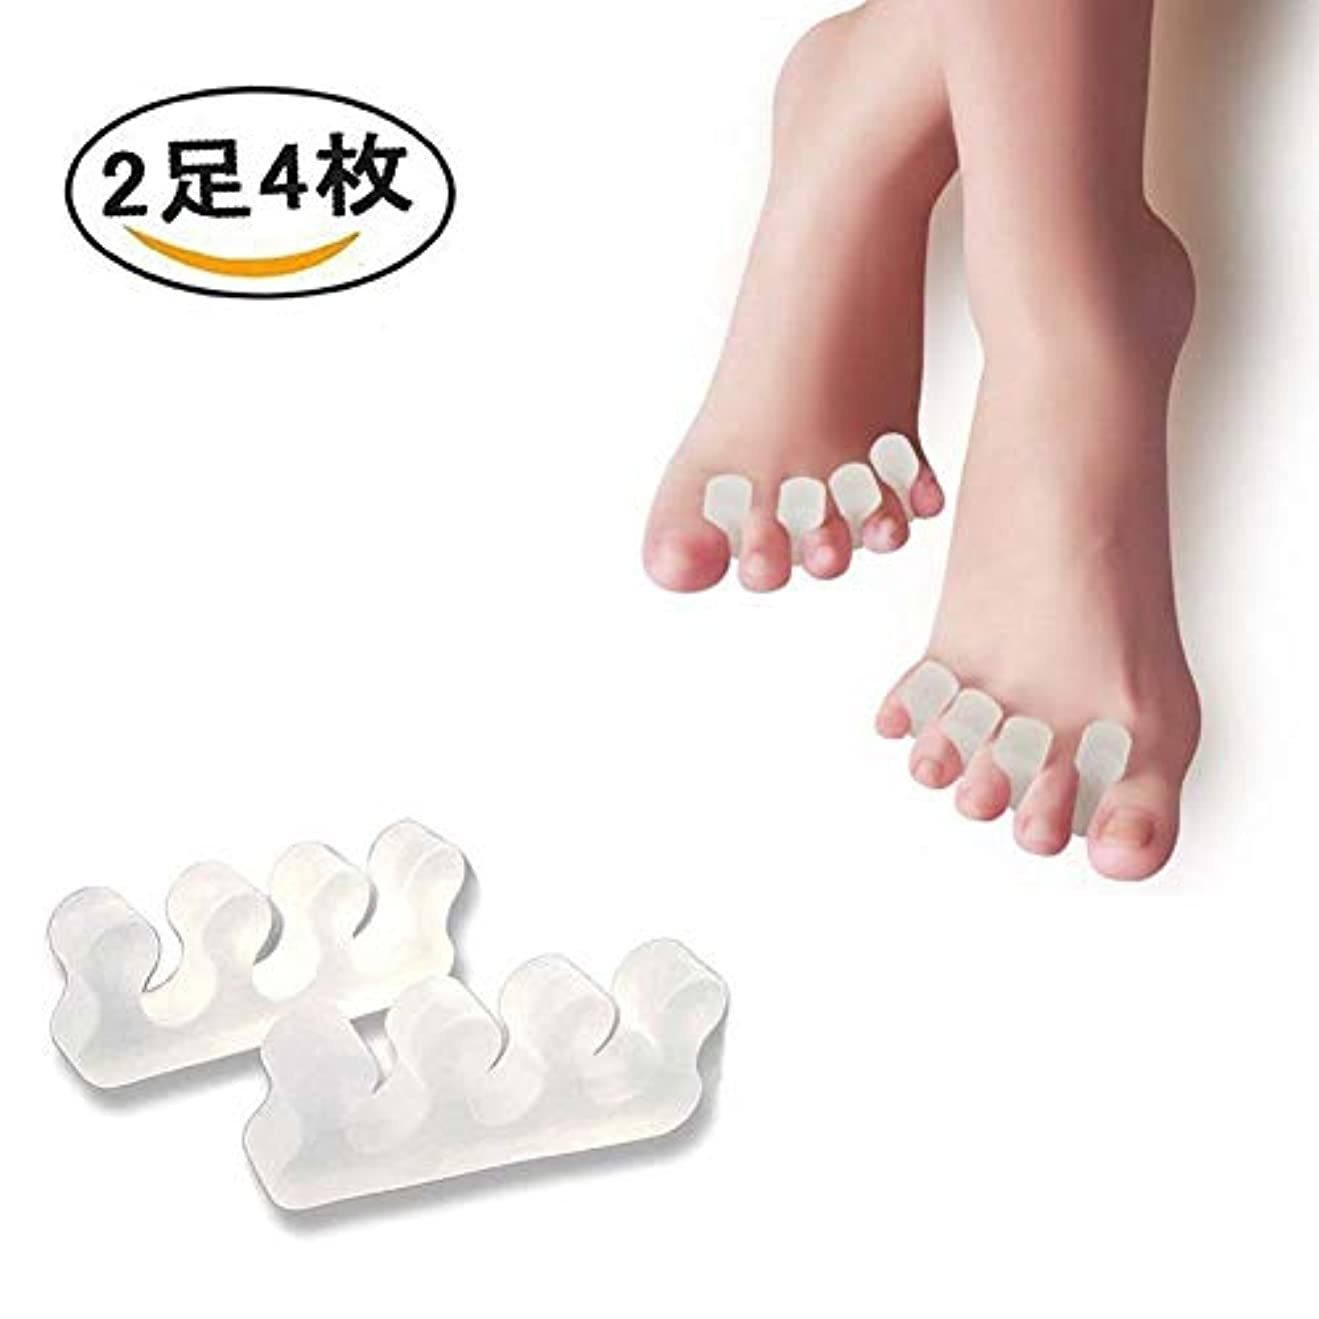 Sendida 2足 (4個入) ヨガ 足指 広げる 医療用シリコーン 足指矯正パッド 足用保護パッド 足指分離パッド 足指矯正具 シリコーン製 3本指 外反母趾